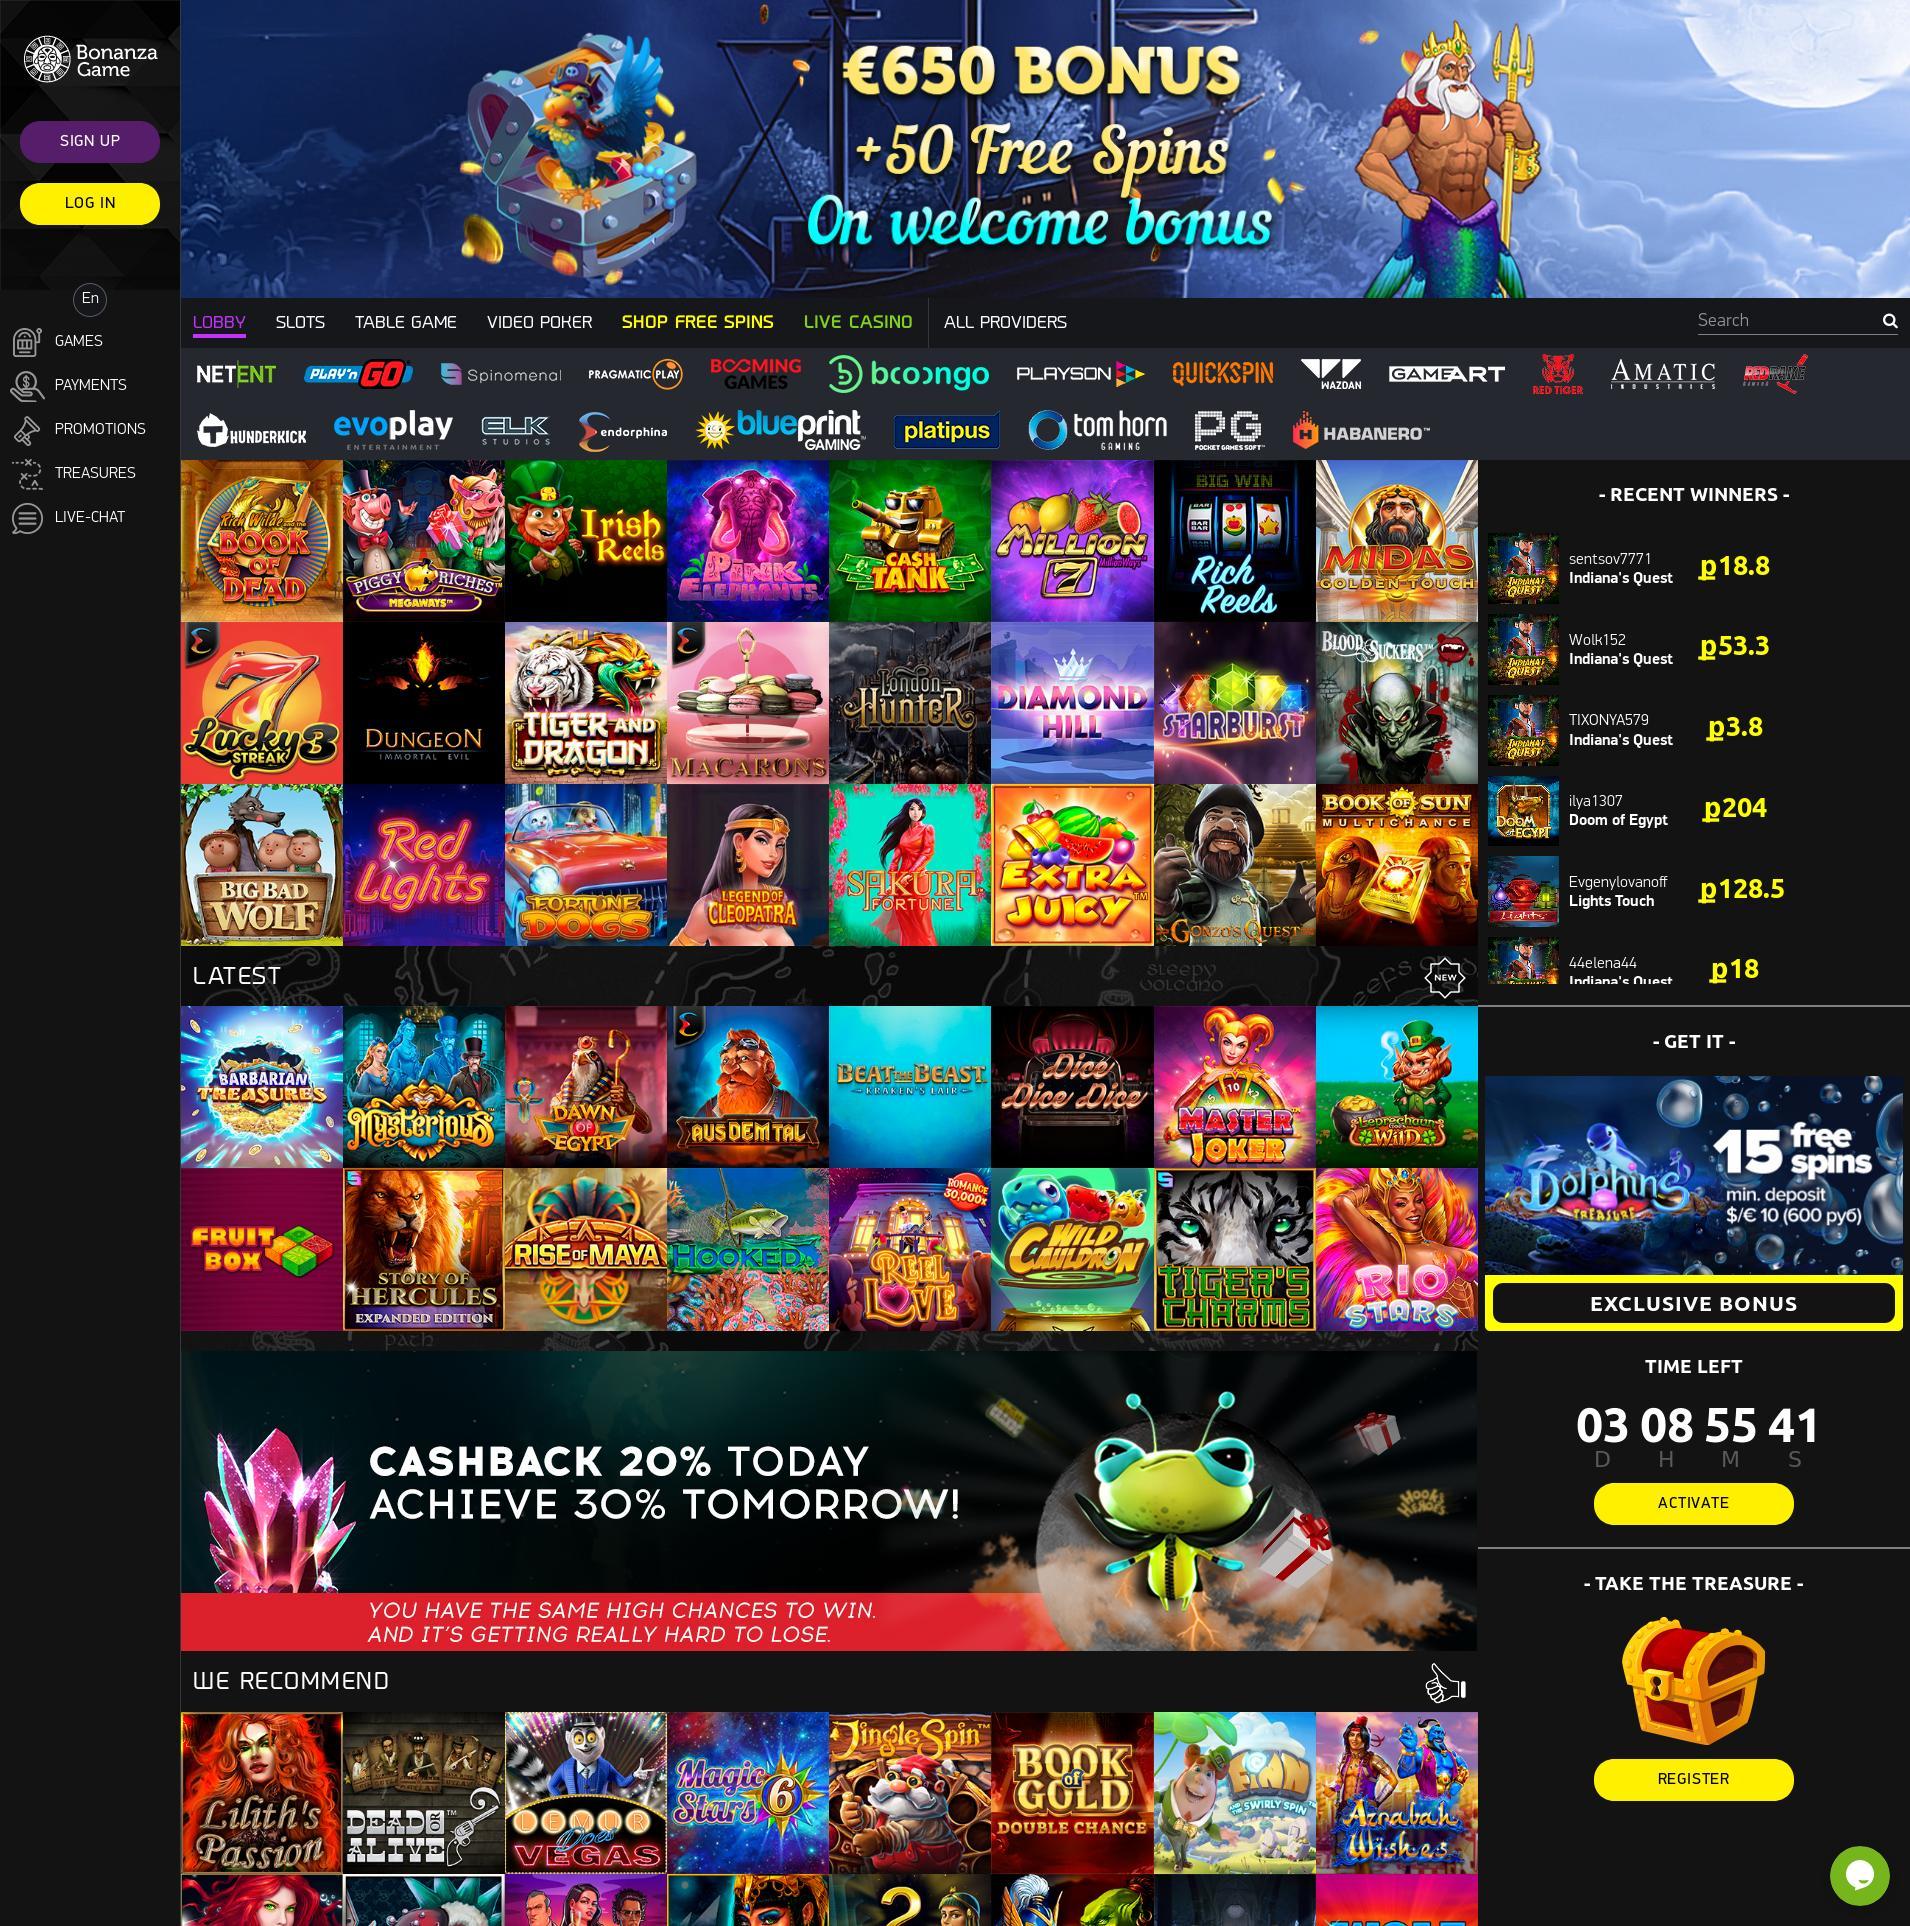 Casino skärm Lobby 2020-04-06 för Norge